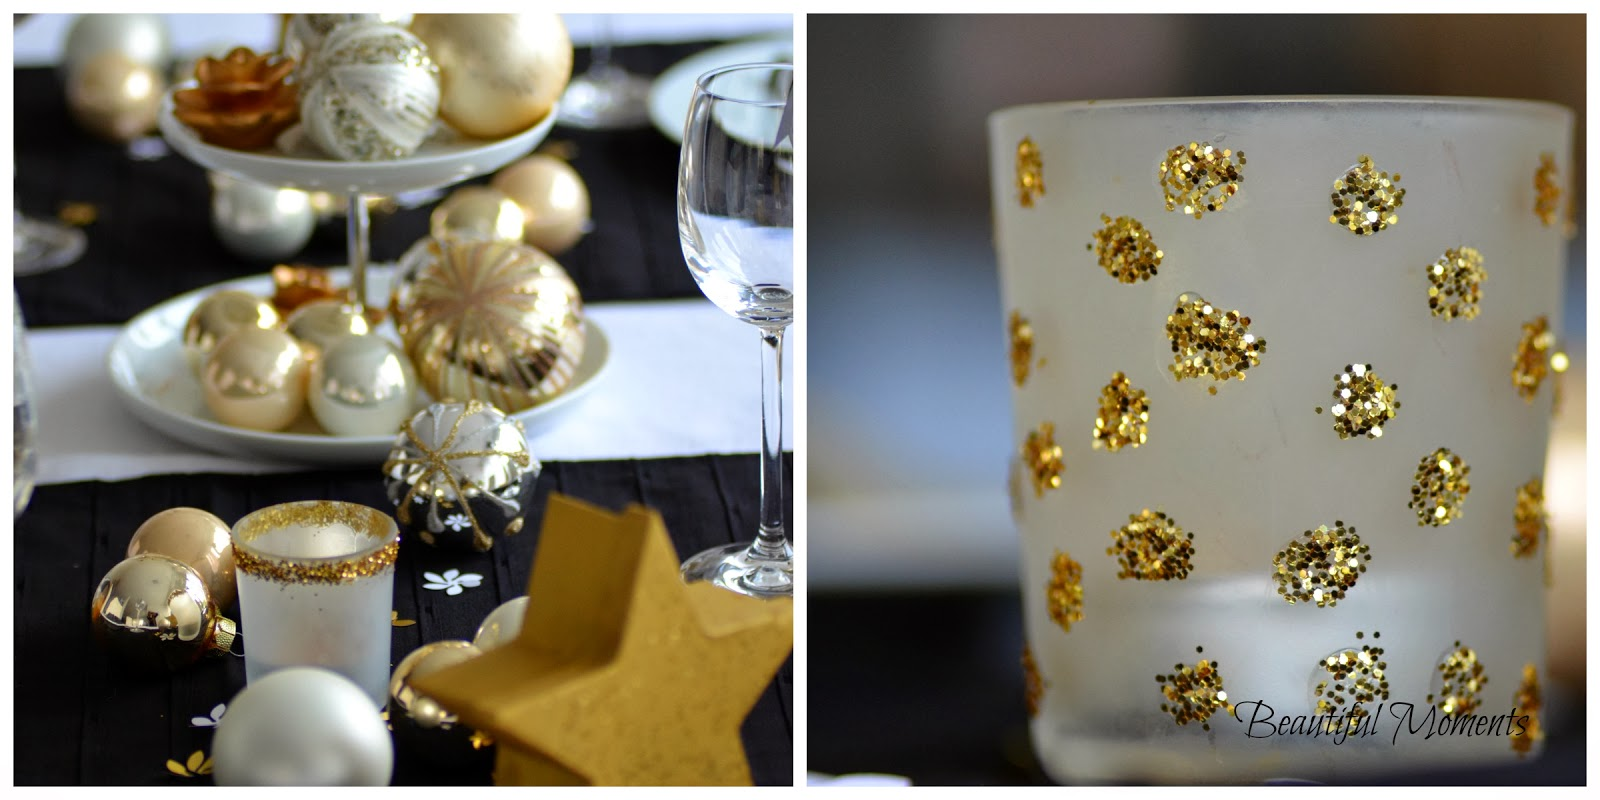 Beautiful Moments Tischdekoideen Fur Weihnachten In Schwarz Weiss Gold